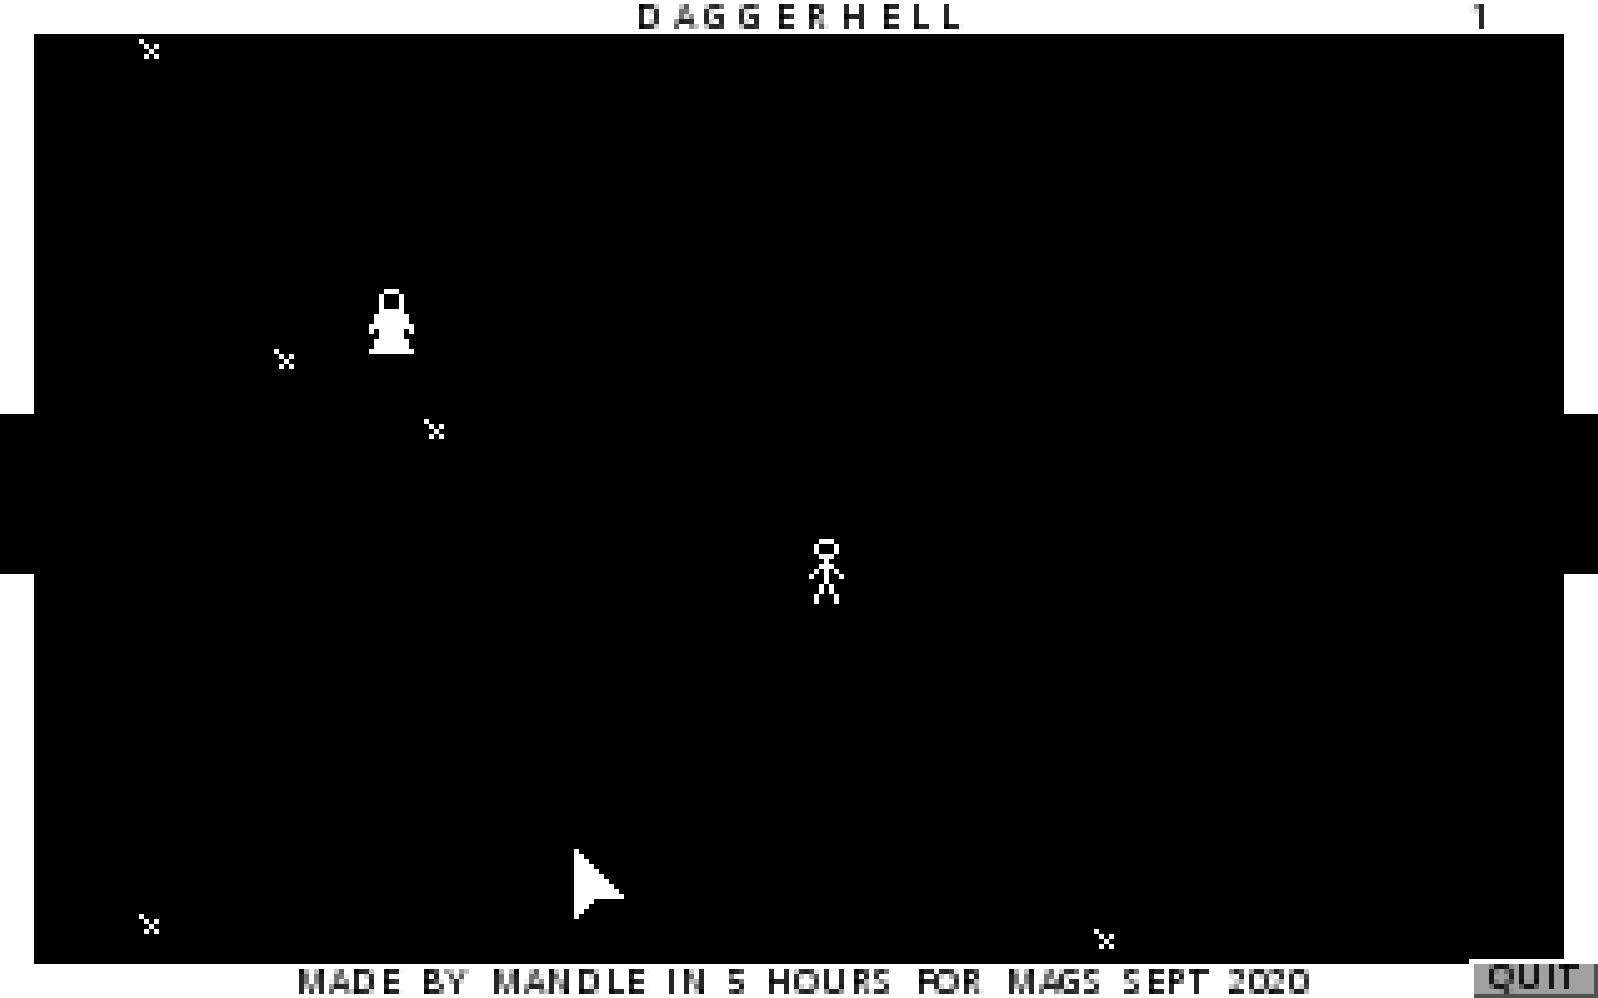 Zoomed screenshot of DAGGERHELL